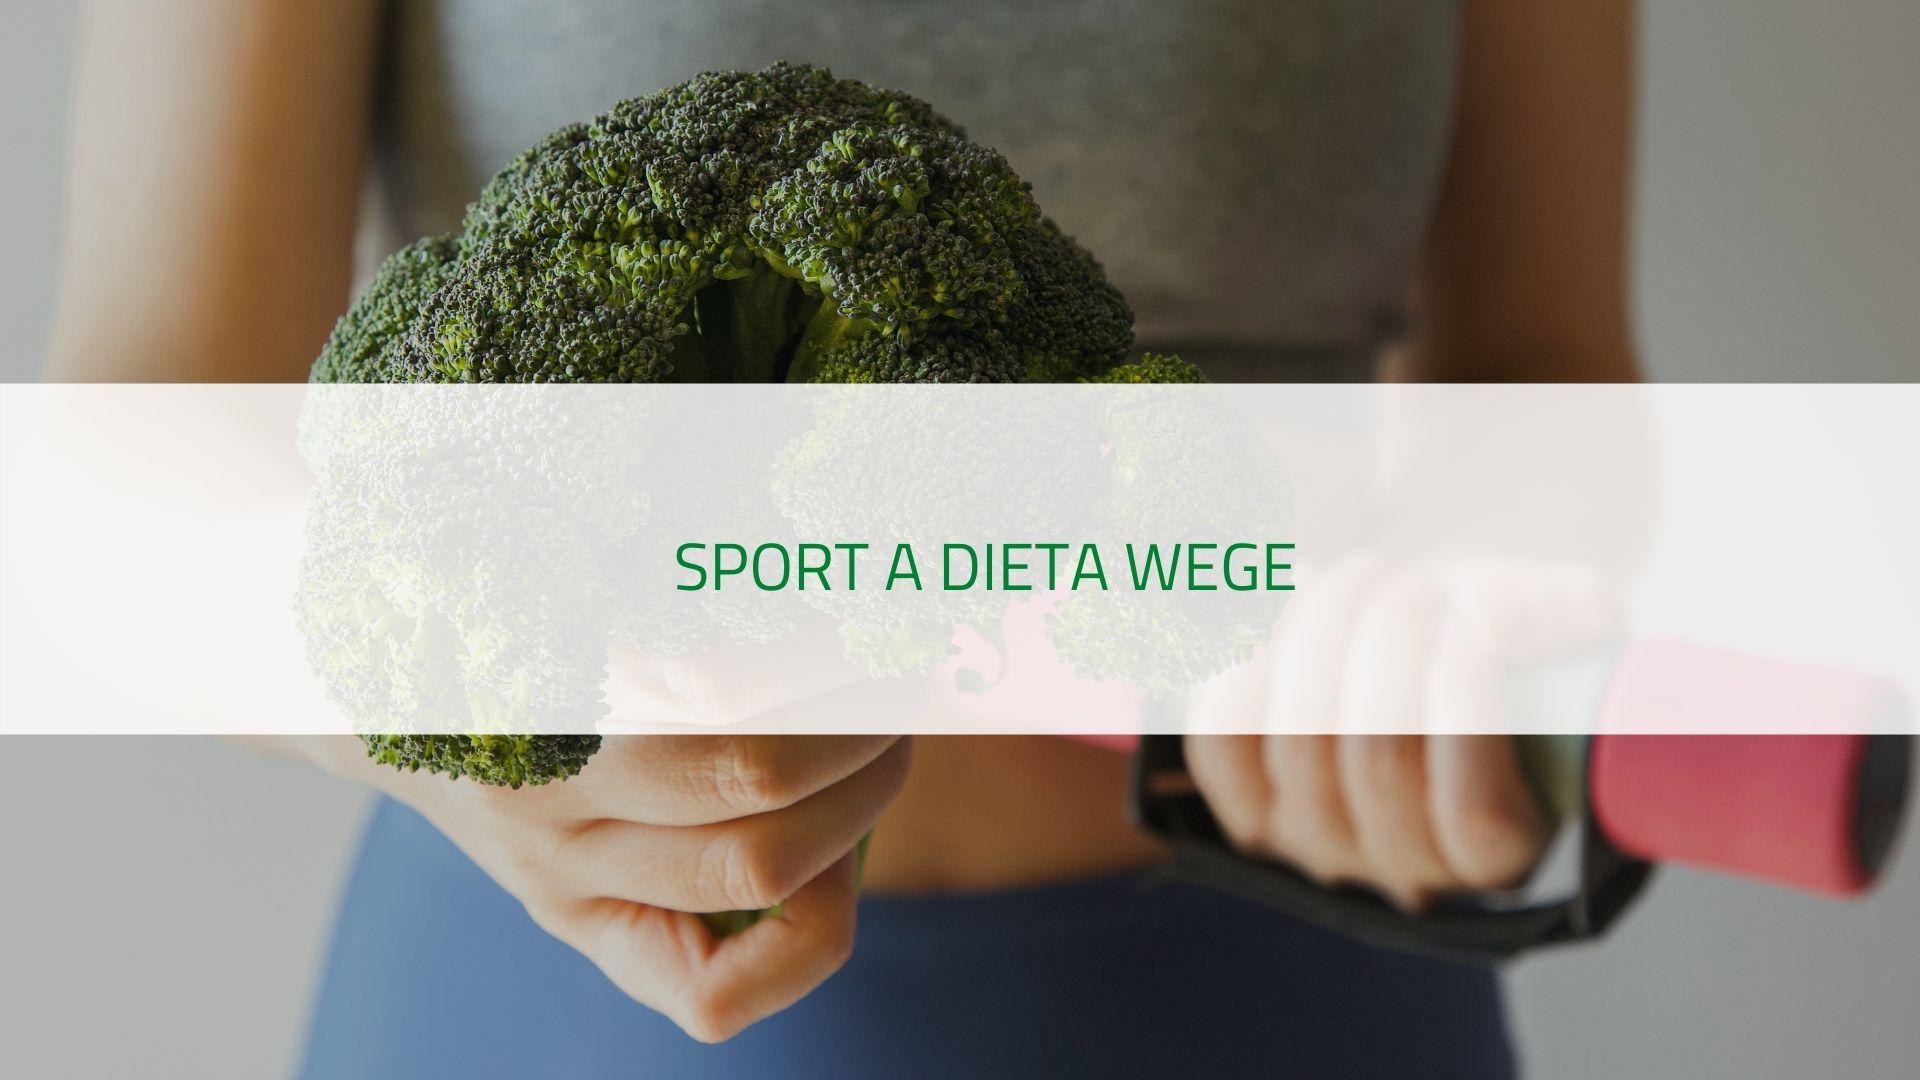 Sport a dieta wege